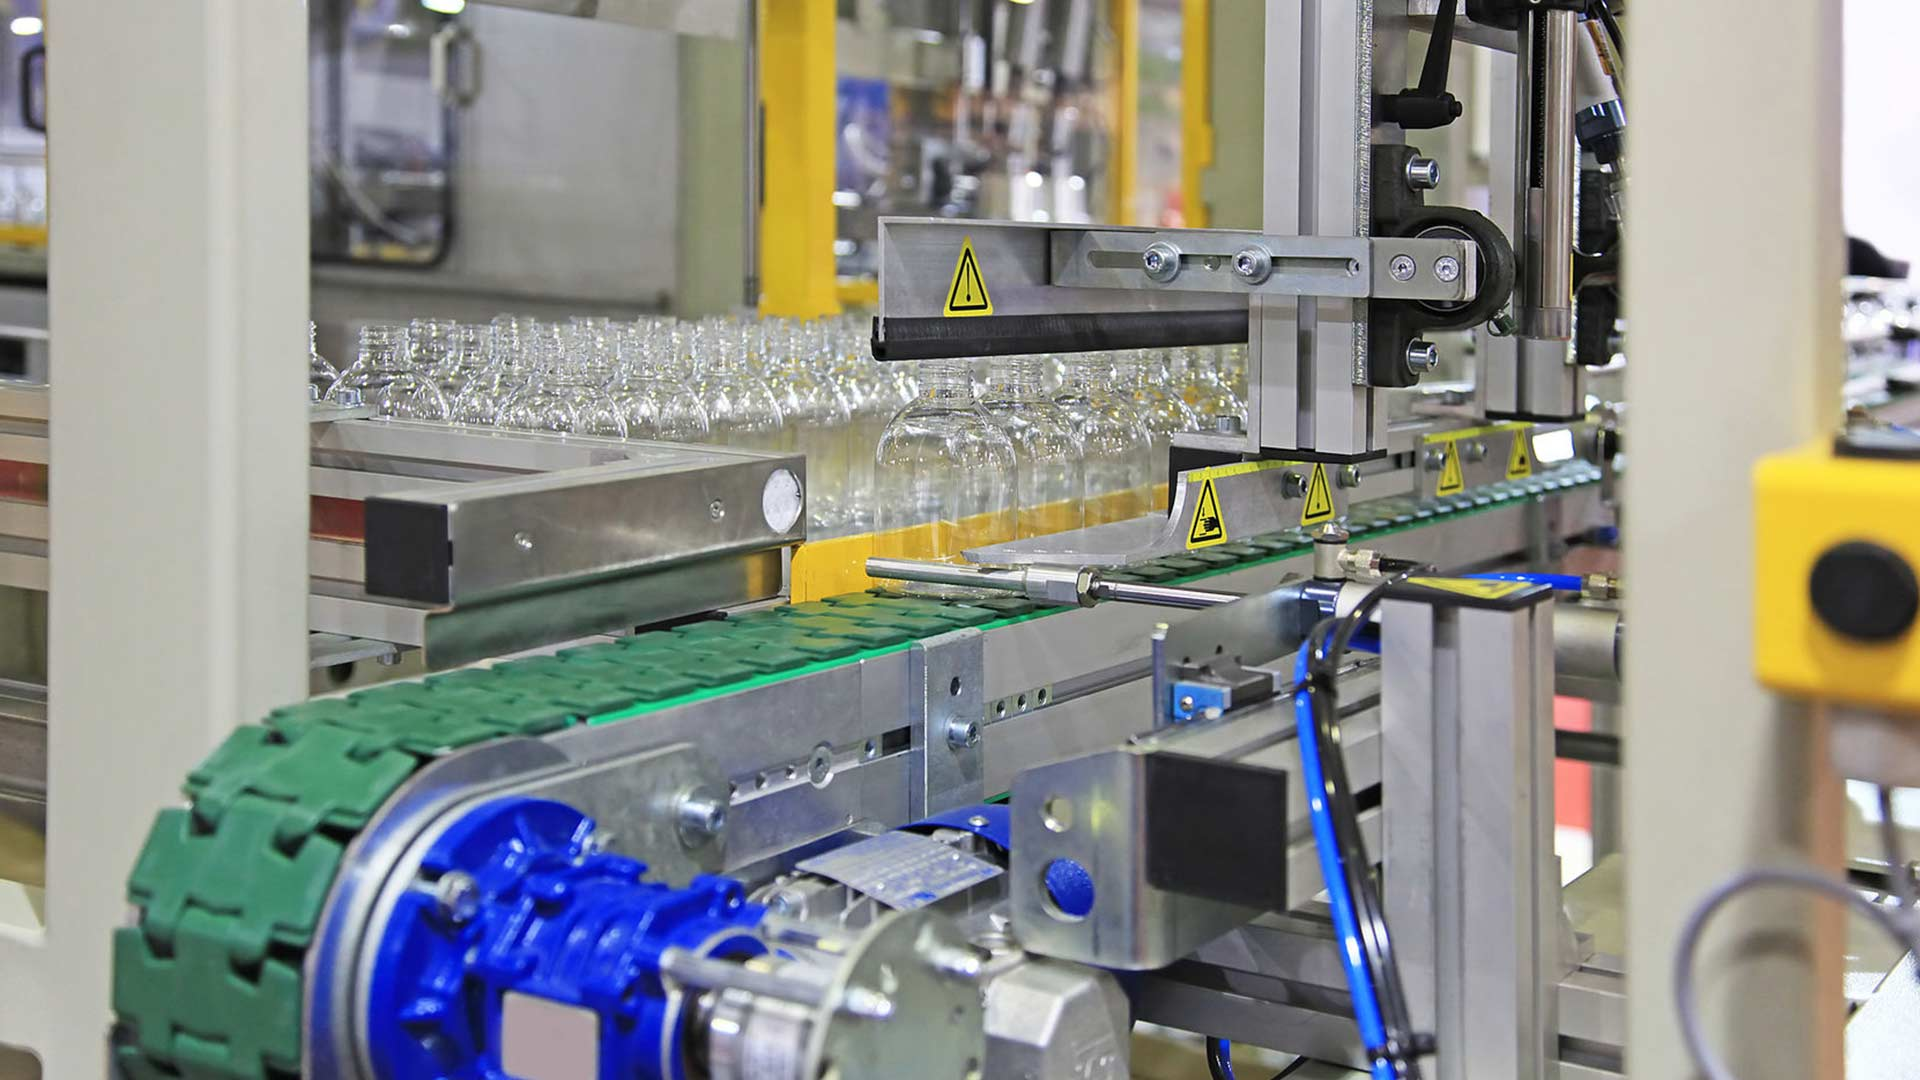 fabrication convoyeur usine